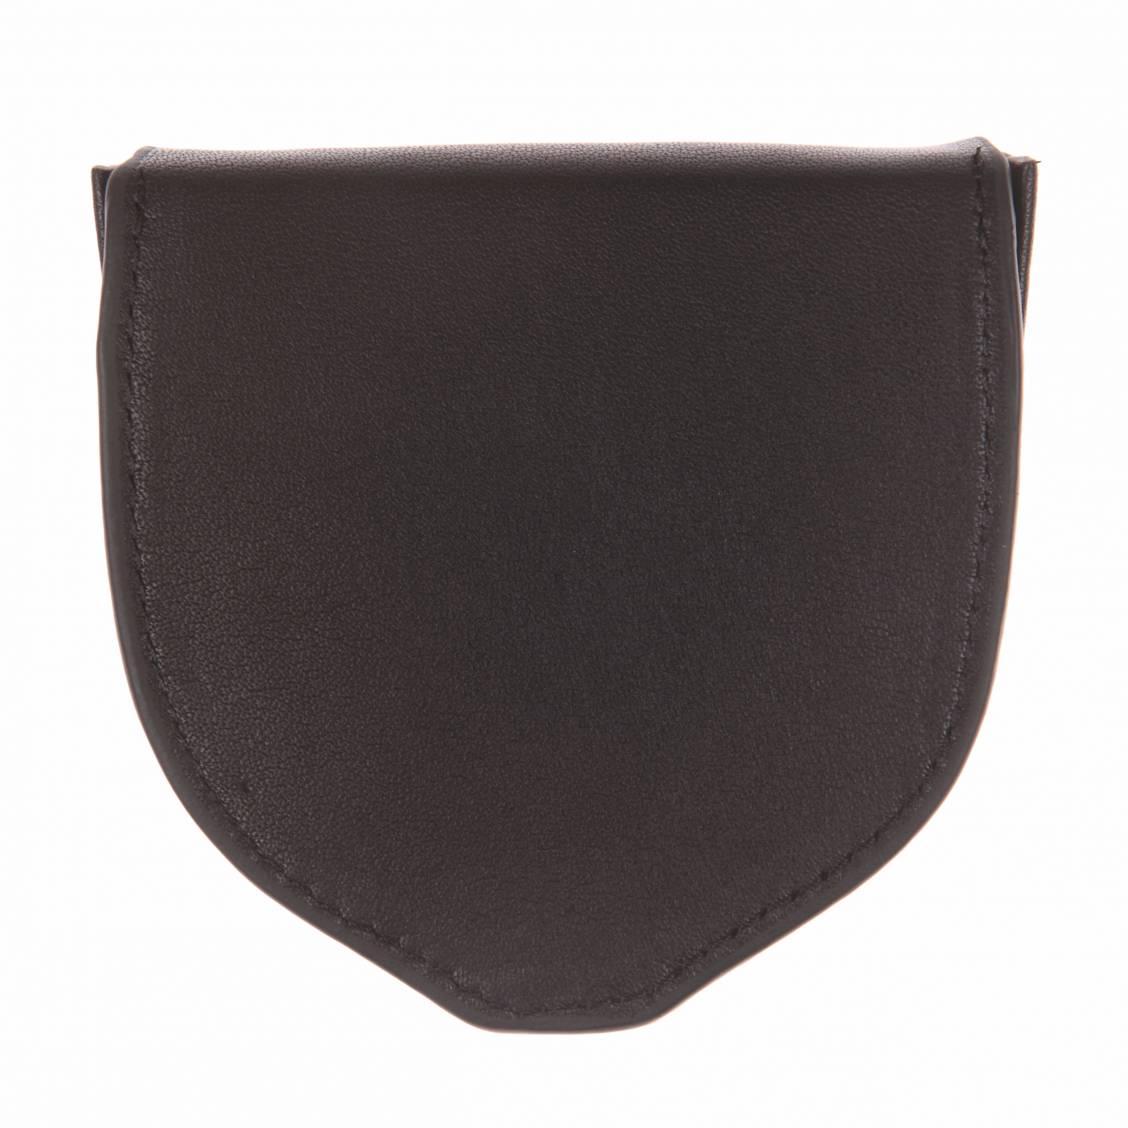 Porte-monnaie L'aiglon rond en cuir lisse noir pZriwiR6b